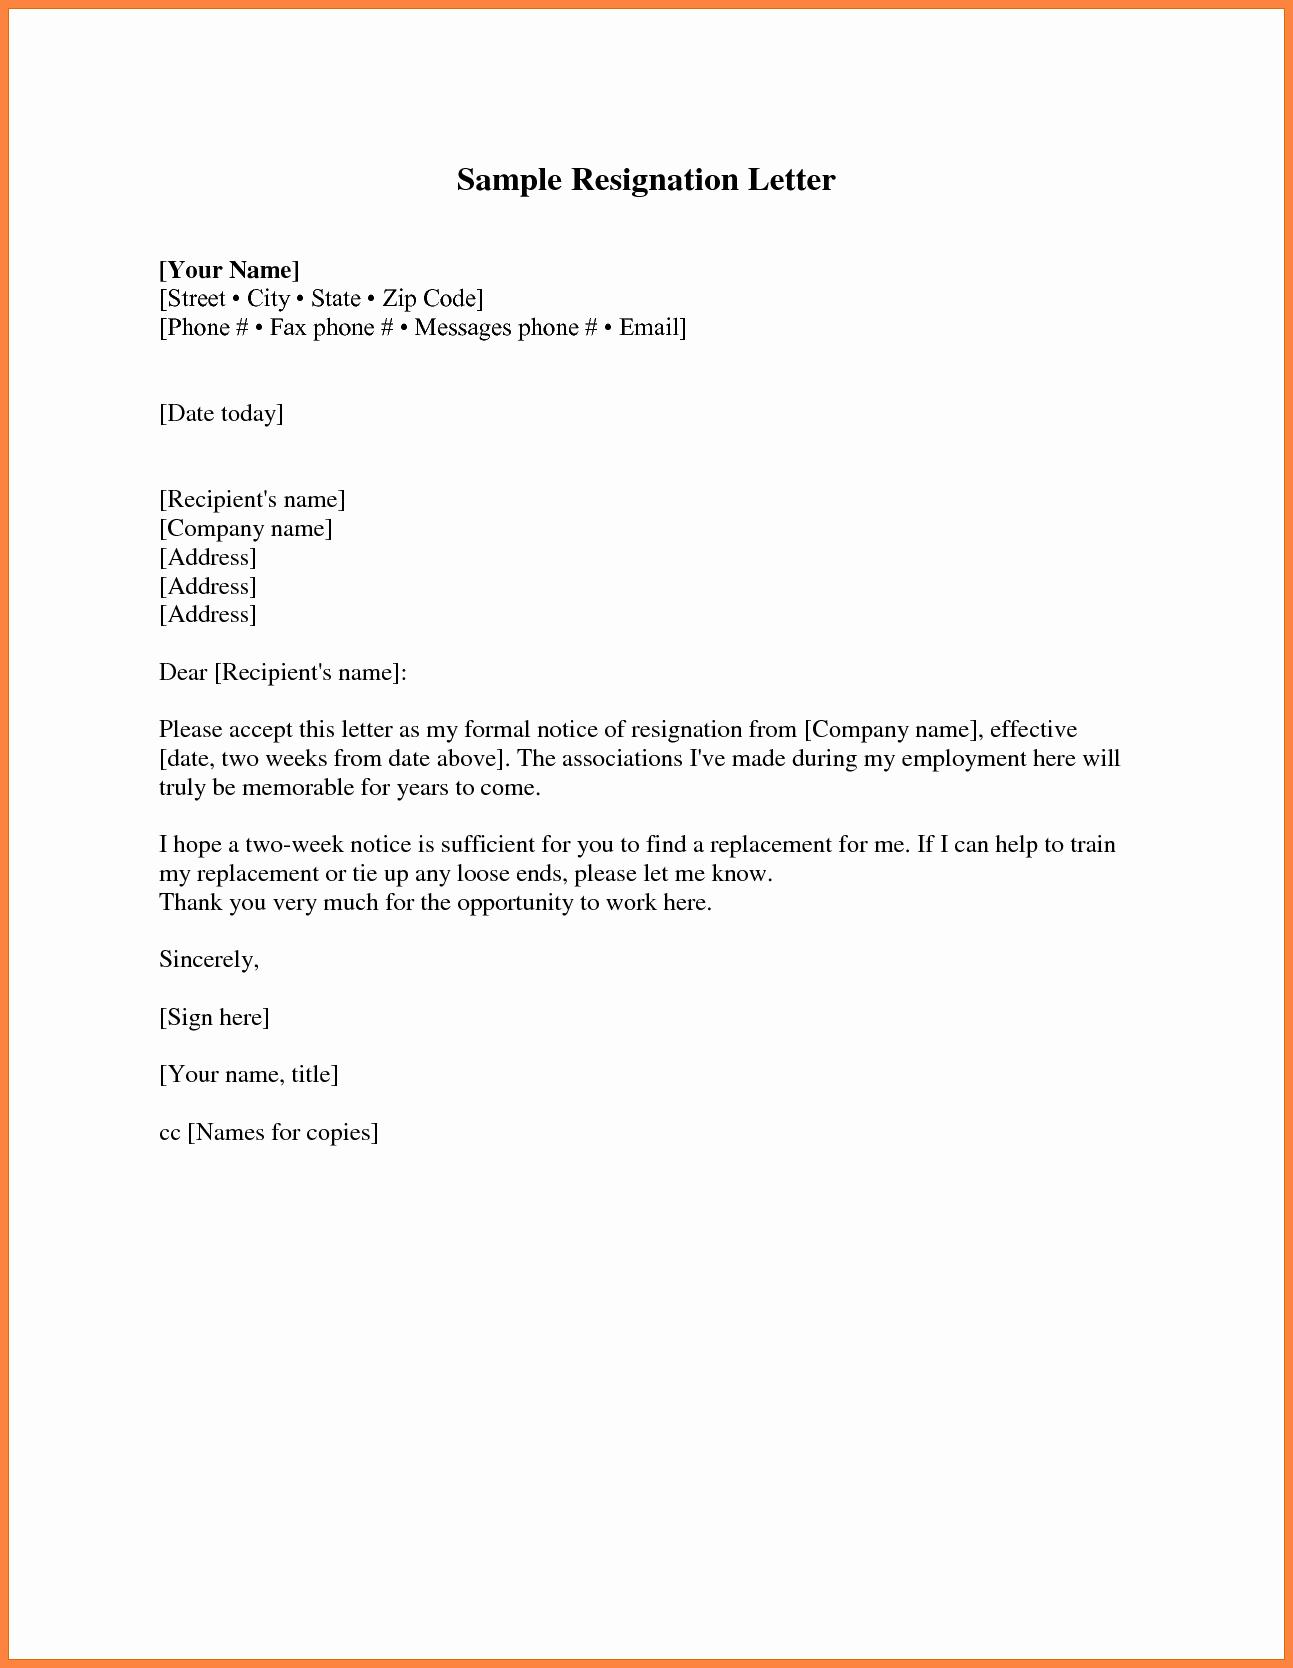 Resignation Letter format Pdf Inspirational 9 Resignation Letter 2 Week Notice Pdf